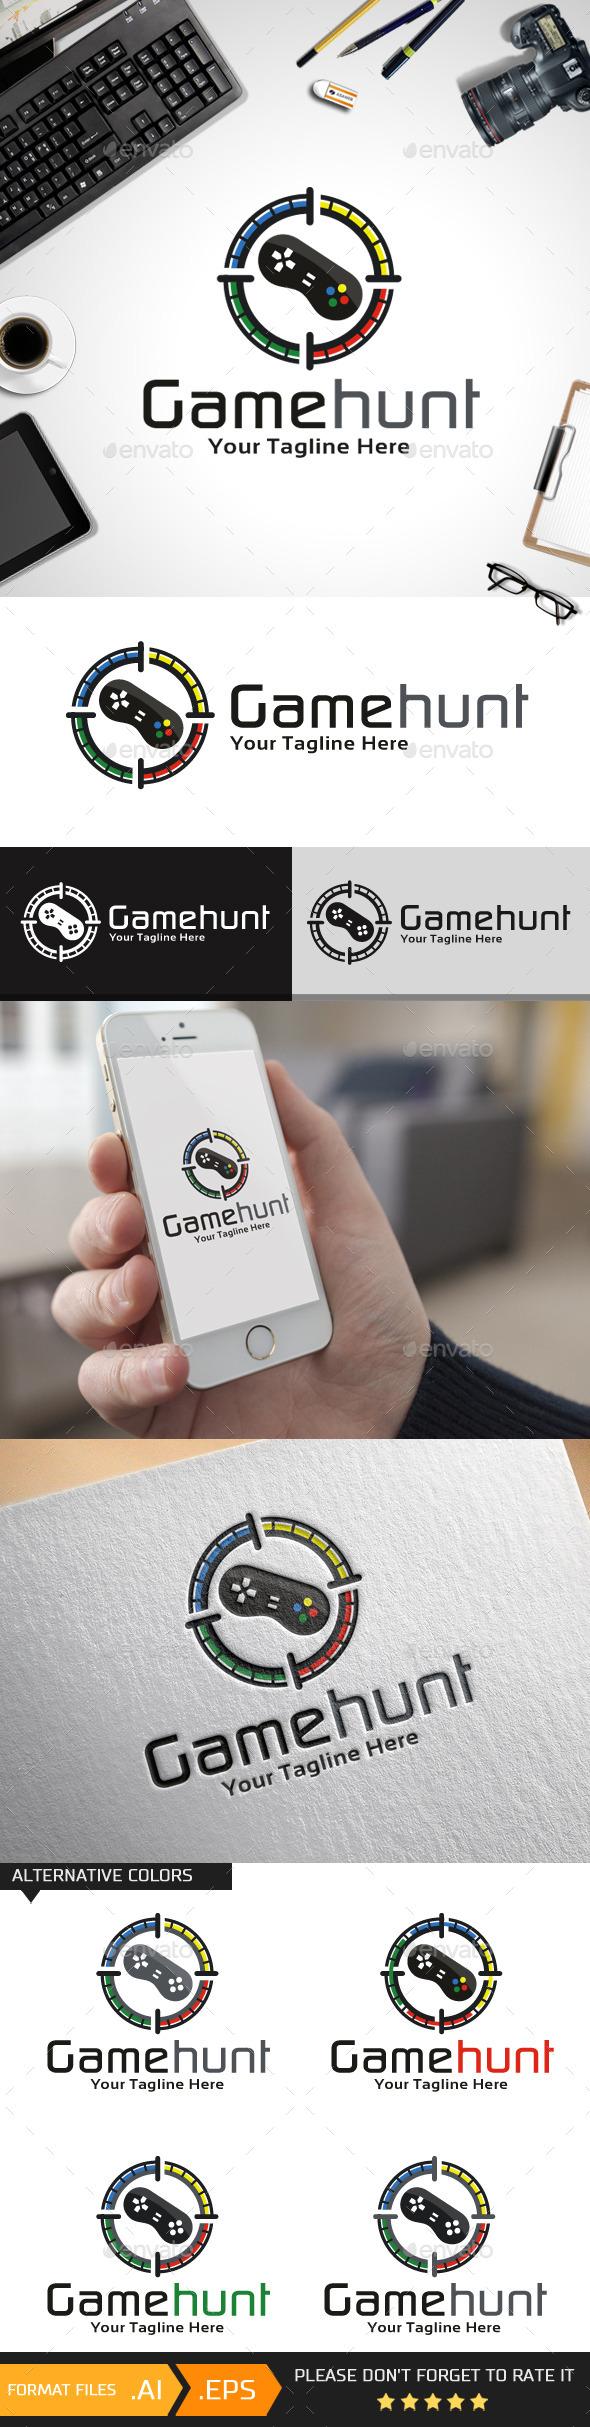 Game Hunt Logo Template